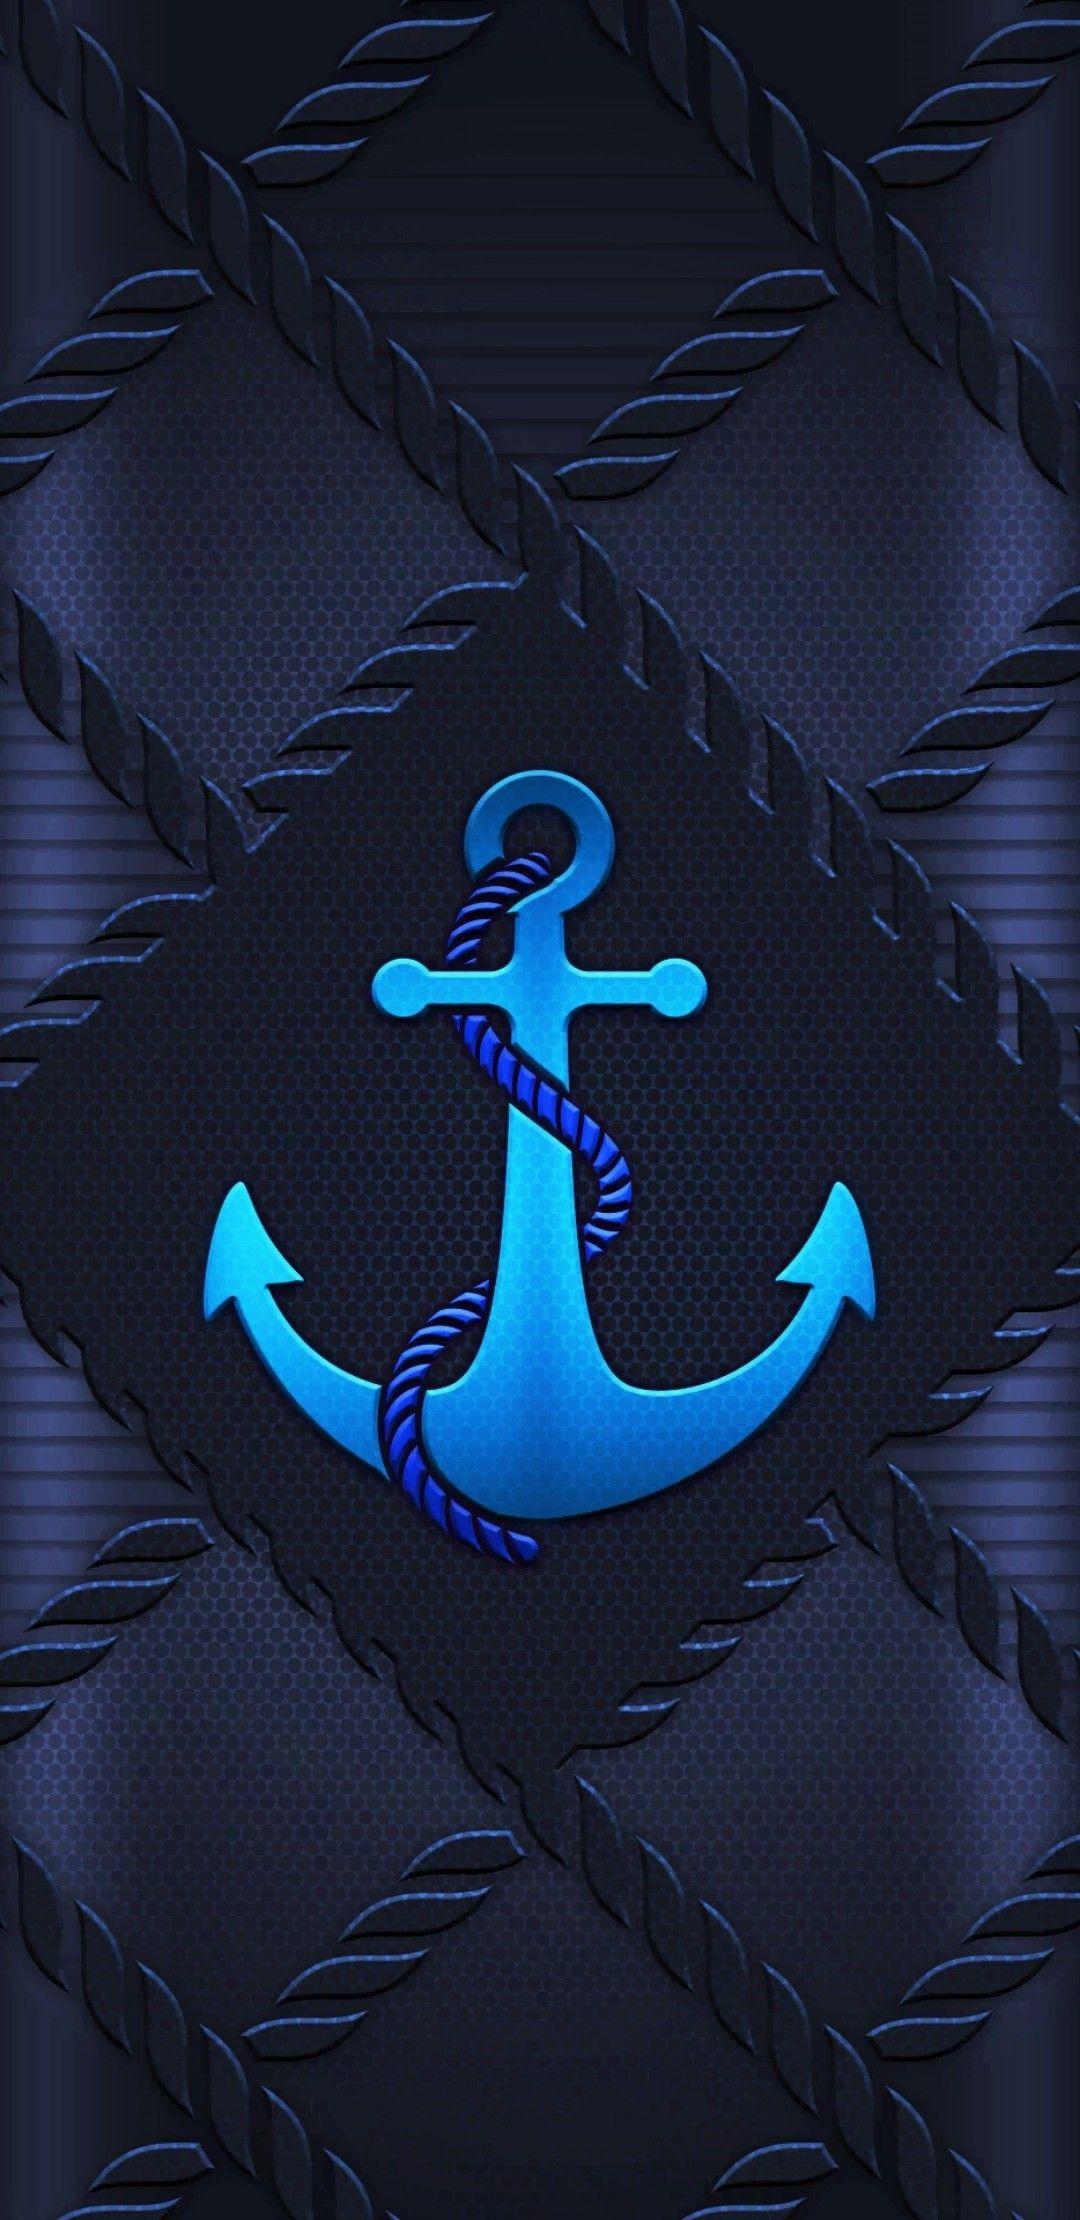 Pin on Anchors / Boats ECT Wallpaper